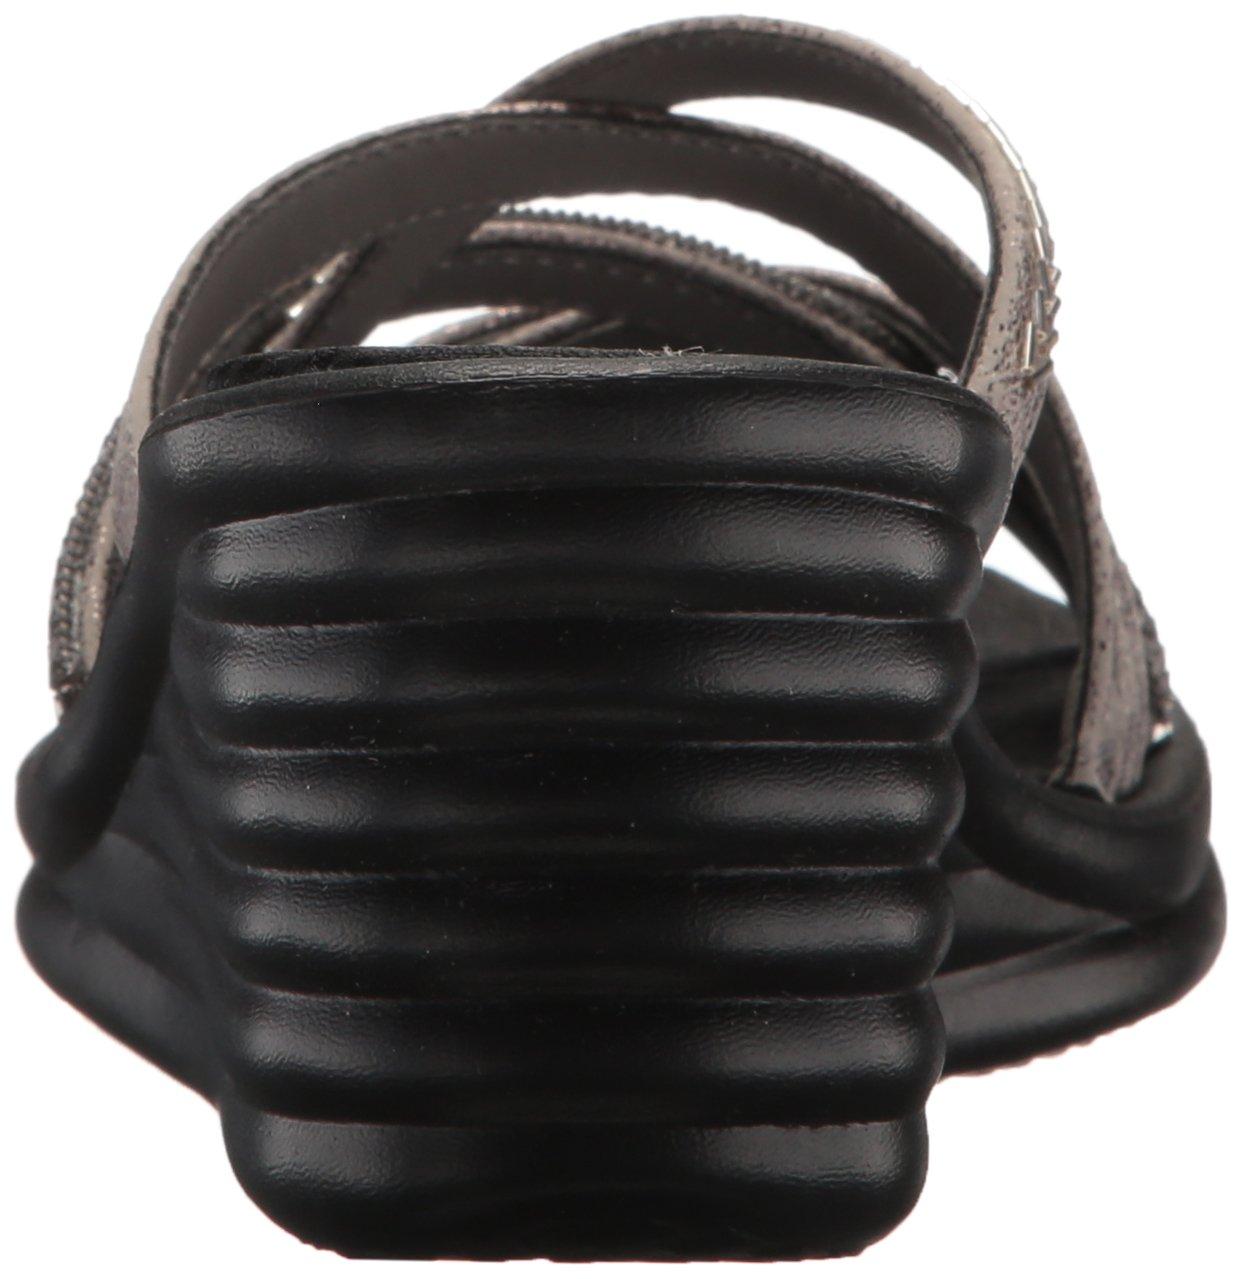 Skechers Cali Women's Rumbler Wave-New Lassie Slide Sandal B077FHHKDJ 9 W US|Pewter